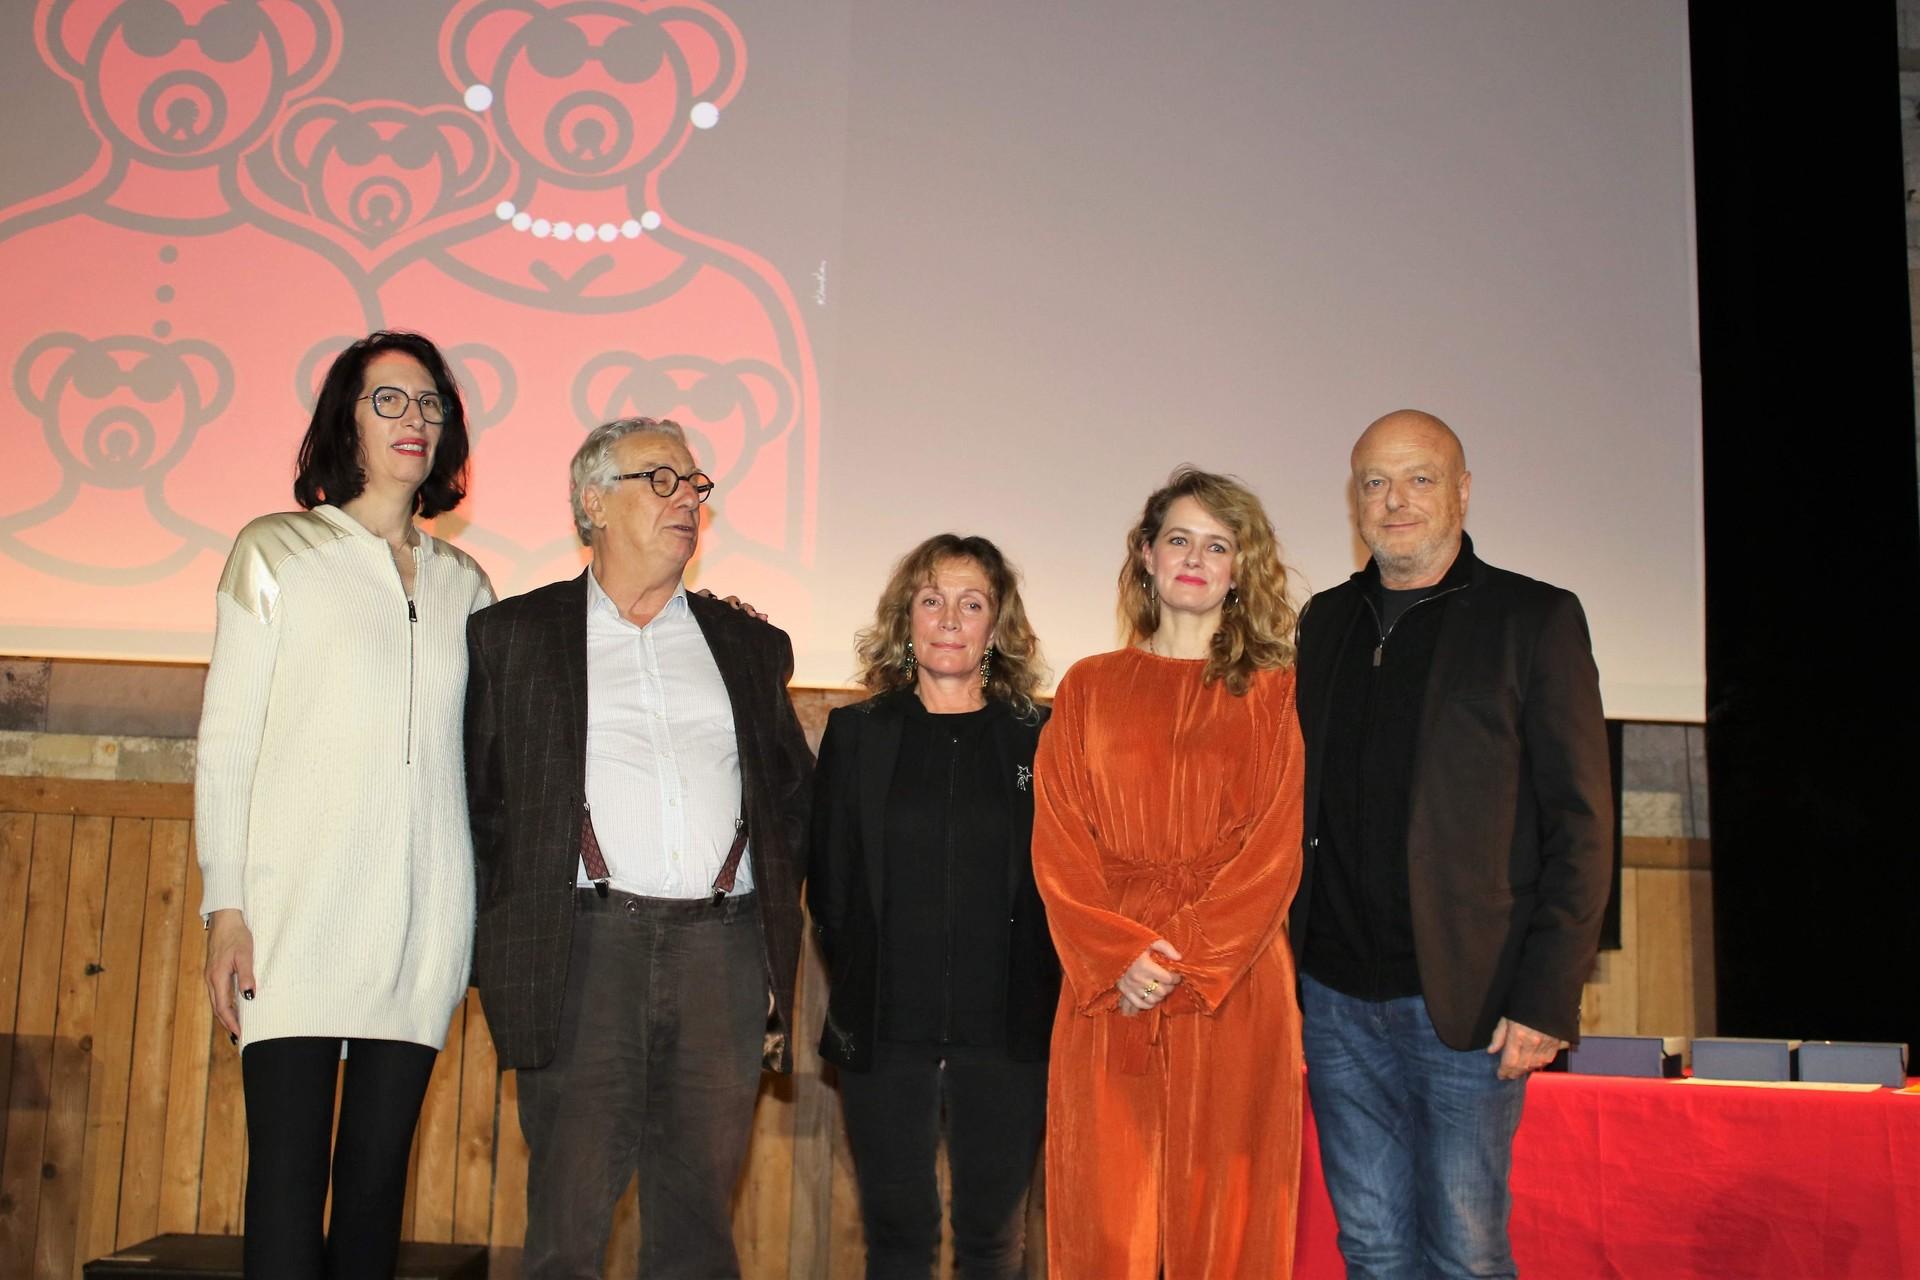 Marie-Pierre Thomas, Guy Konopnicki, Aline-Louise Issermann, Julie Delarme, Gérard Krawczyk